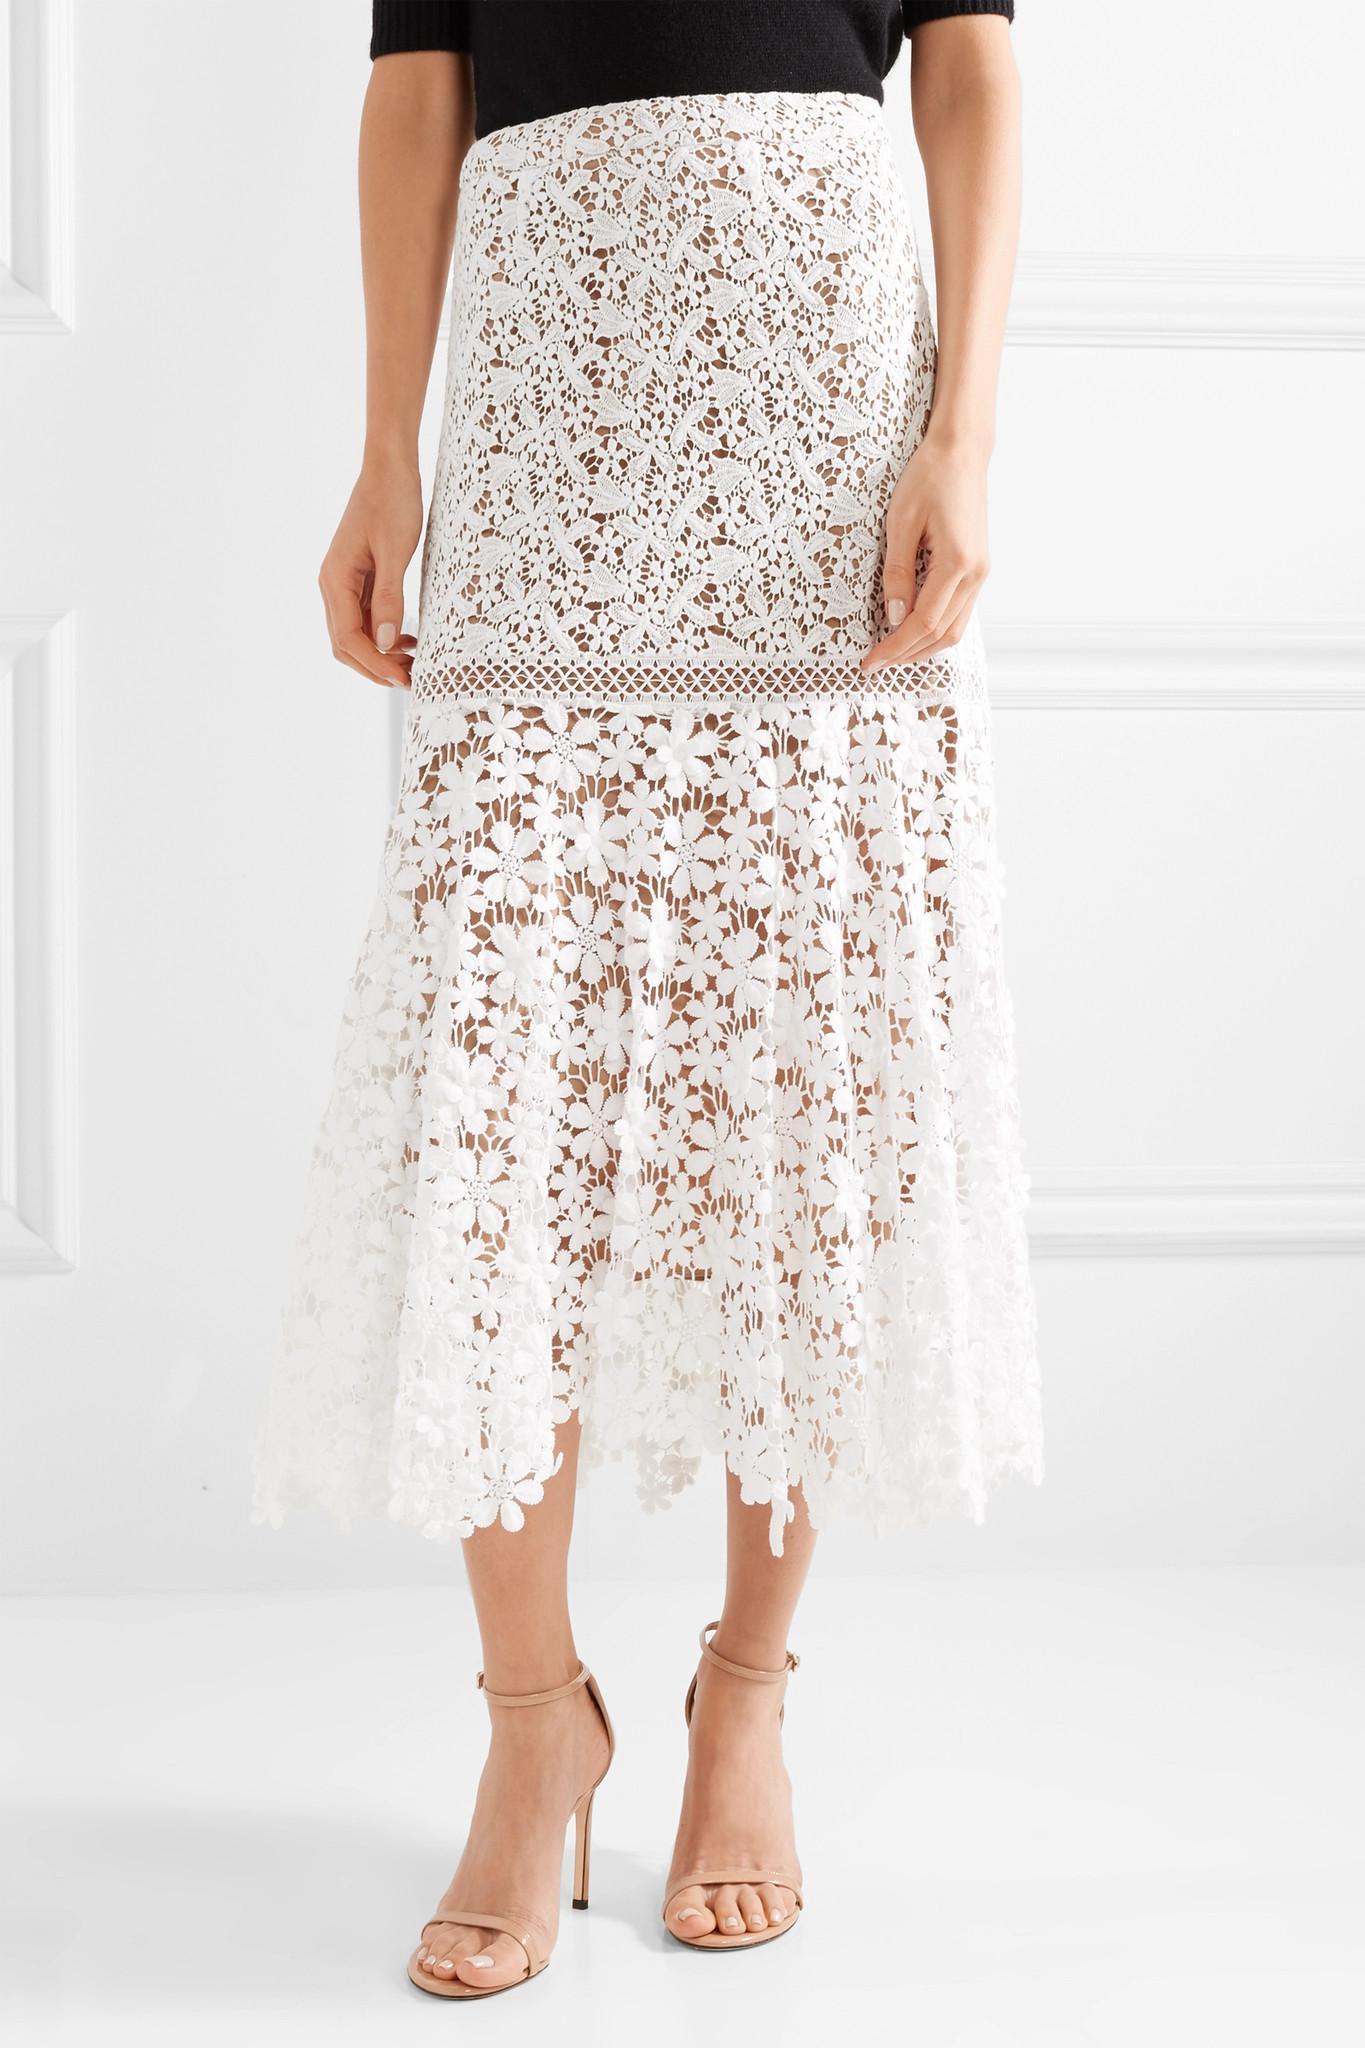 be36e2d468 MICHAEL Michael Kors Cotton Guipure Lace Midi Skirt White in White ...